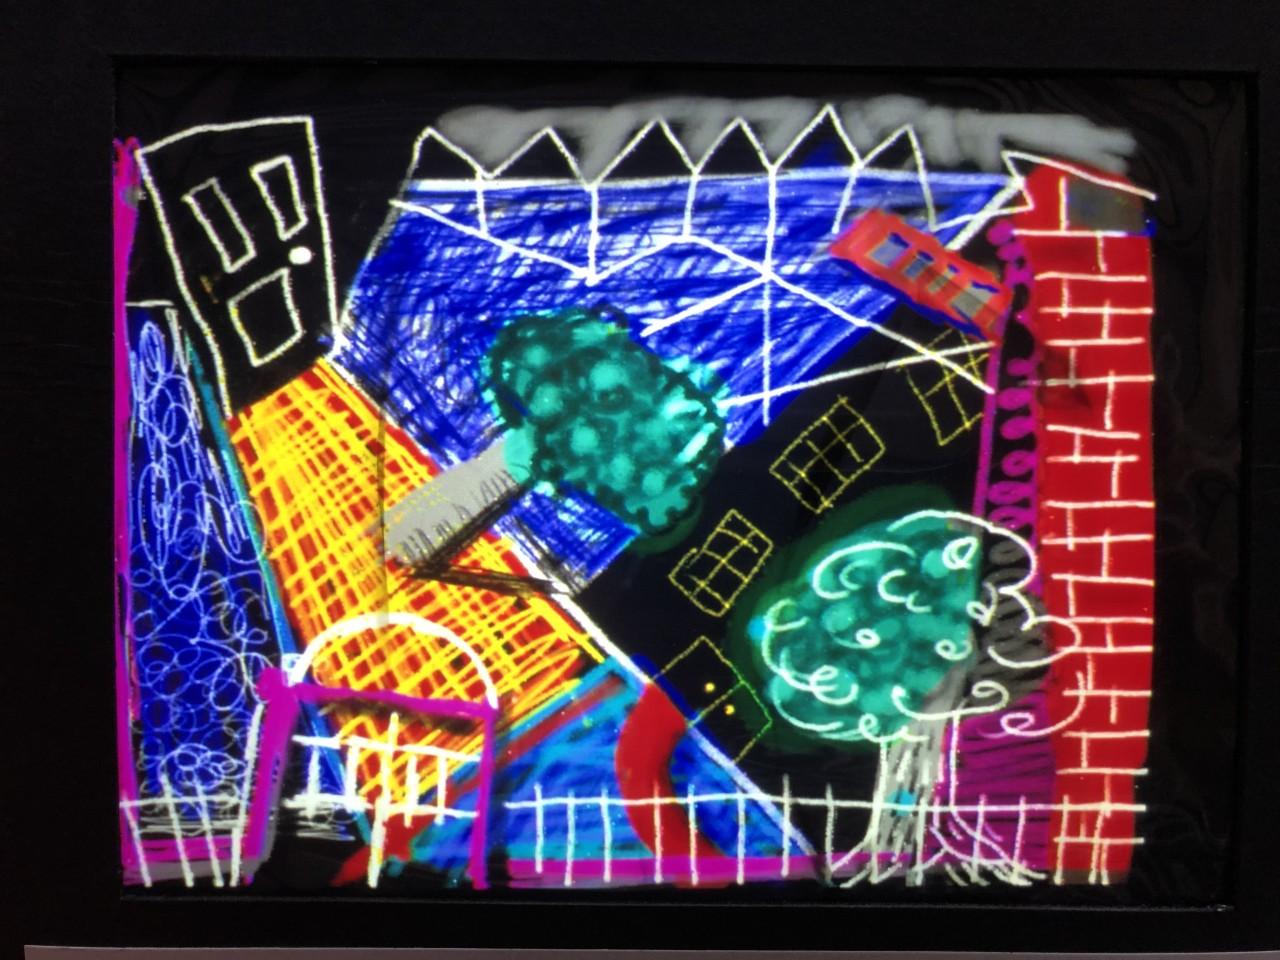 David Hockney, 'Pembroke Studio' Computer Drawing, 1986